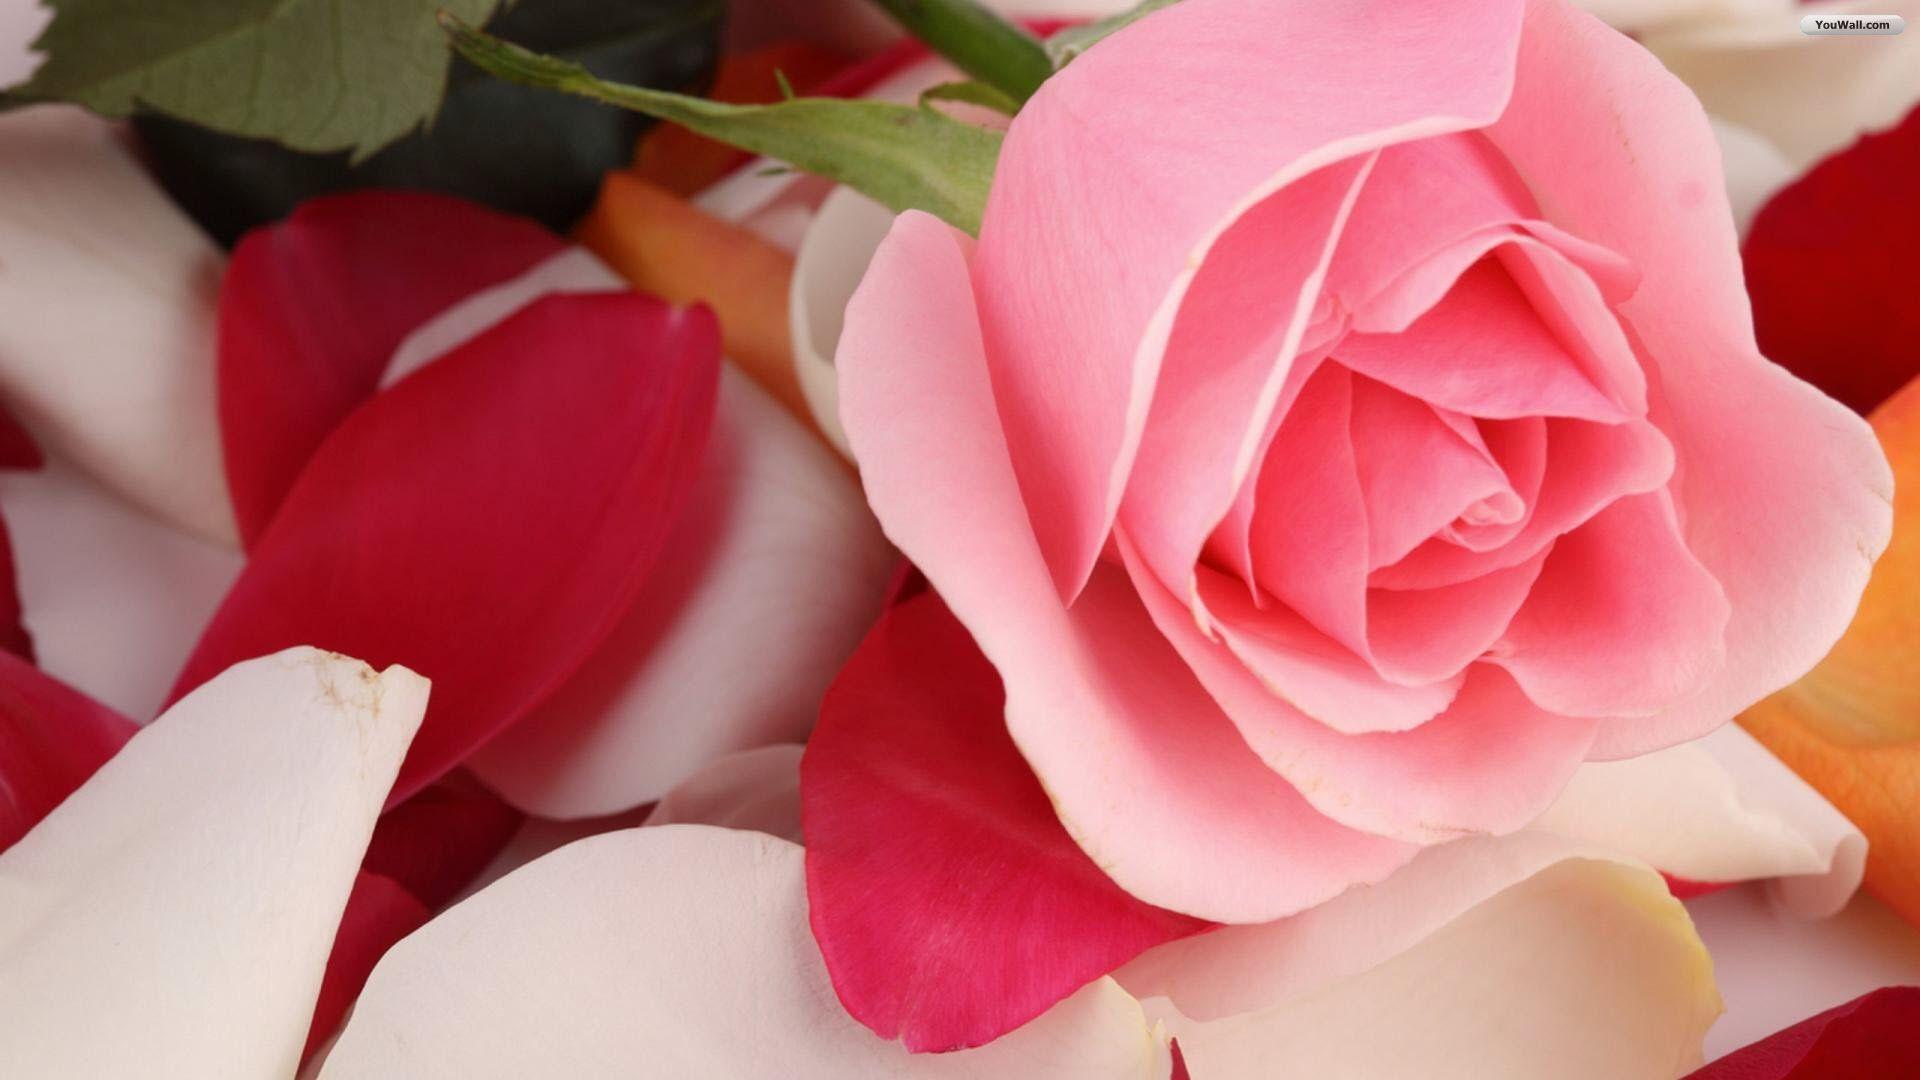 Rose Wallpaper Flower Wallpaper Pink Roses Background